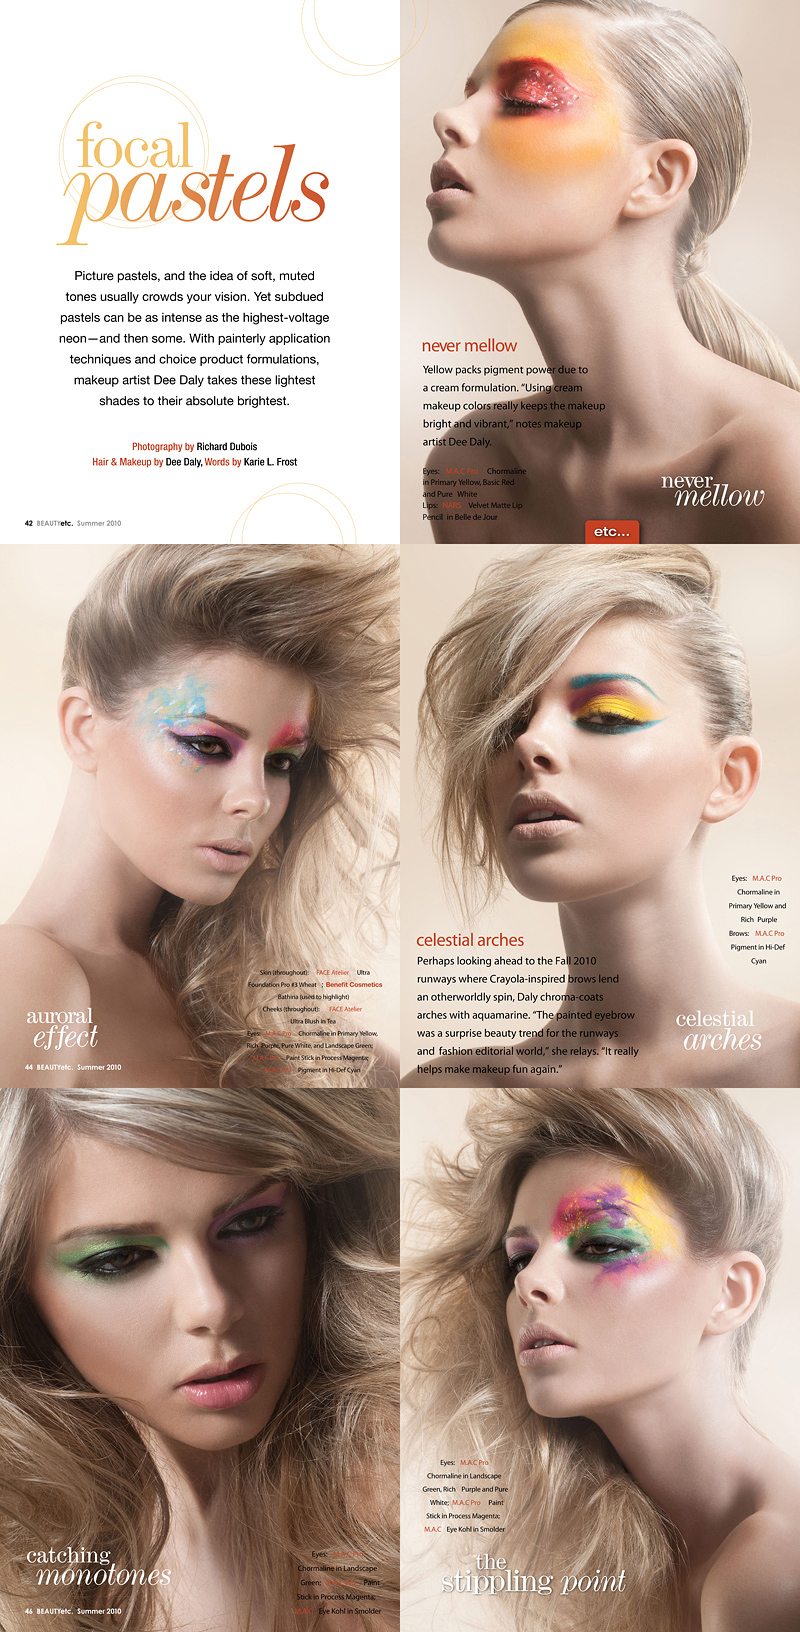 Aug 10, 2010 Photo: Richard Dubois Beauty Etc Publication